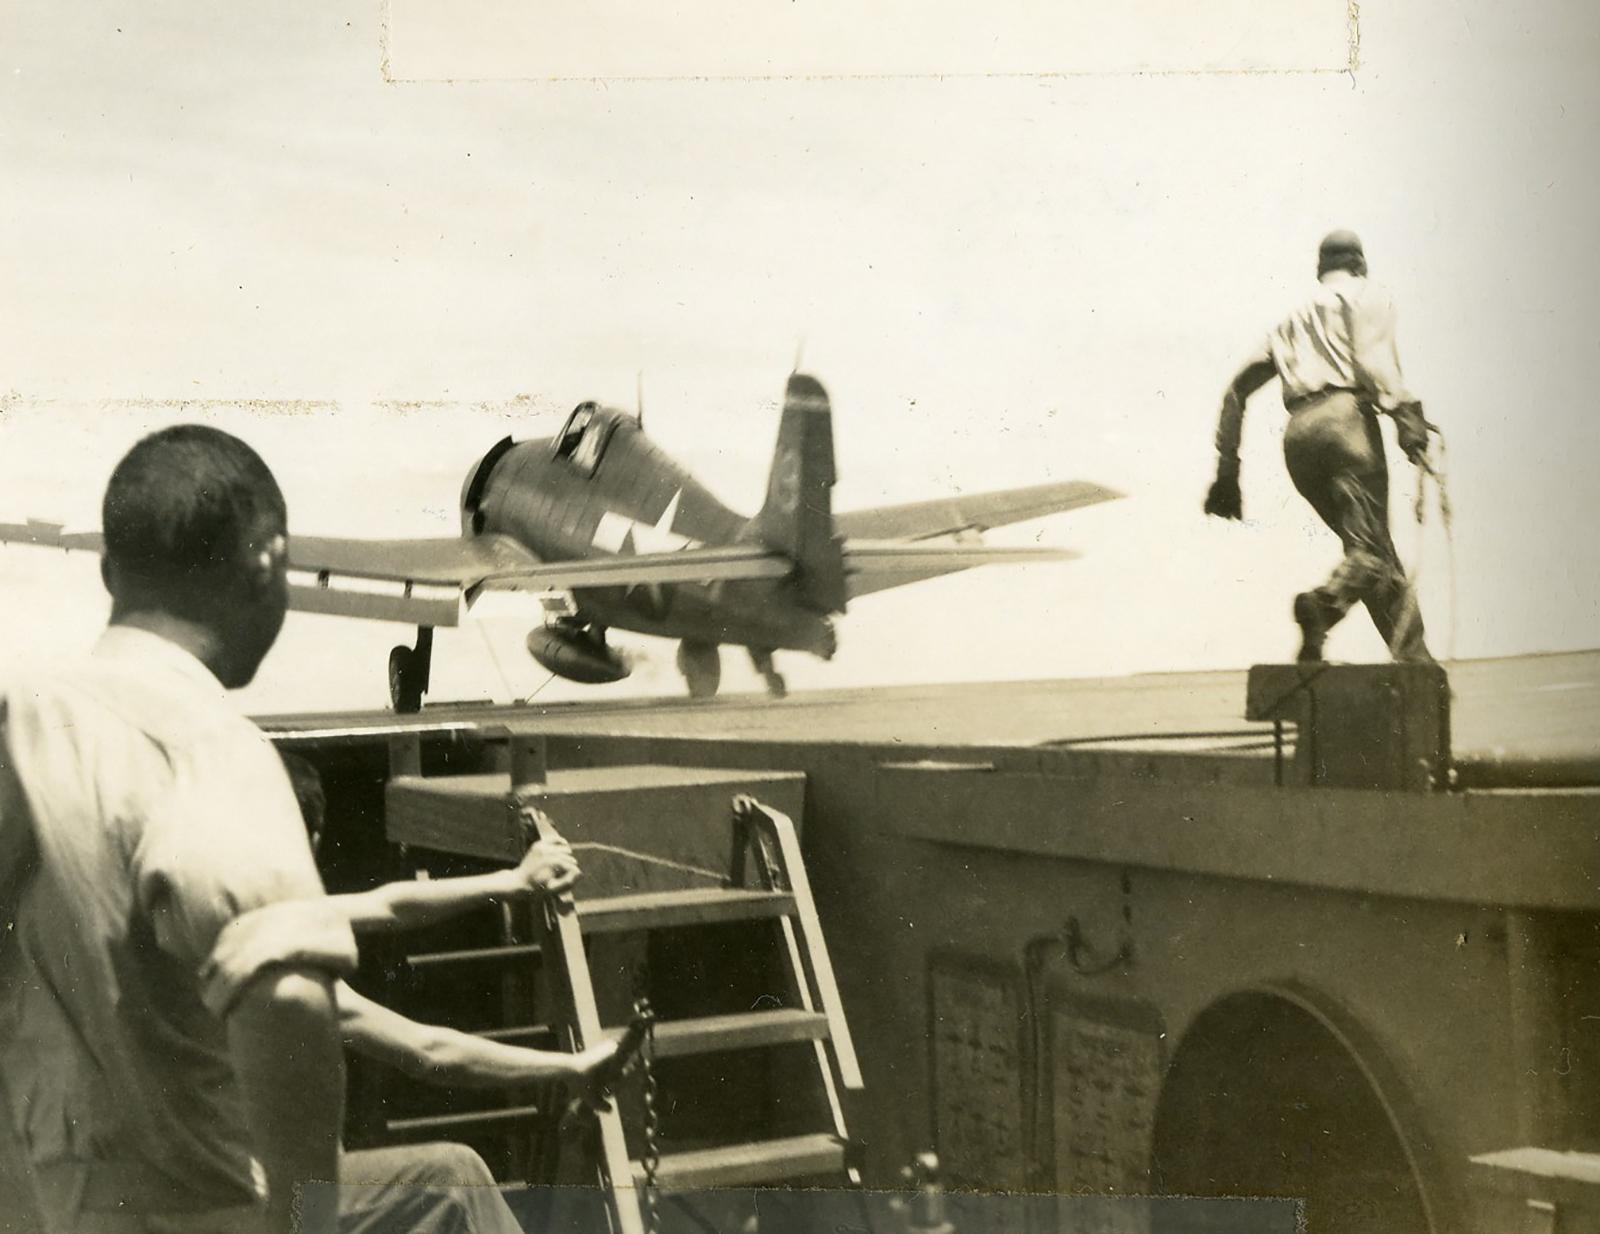 Grumman F6F 3 Hellcat GAG 15 White 19 CVL 27 USS Langley April 1944 01